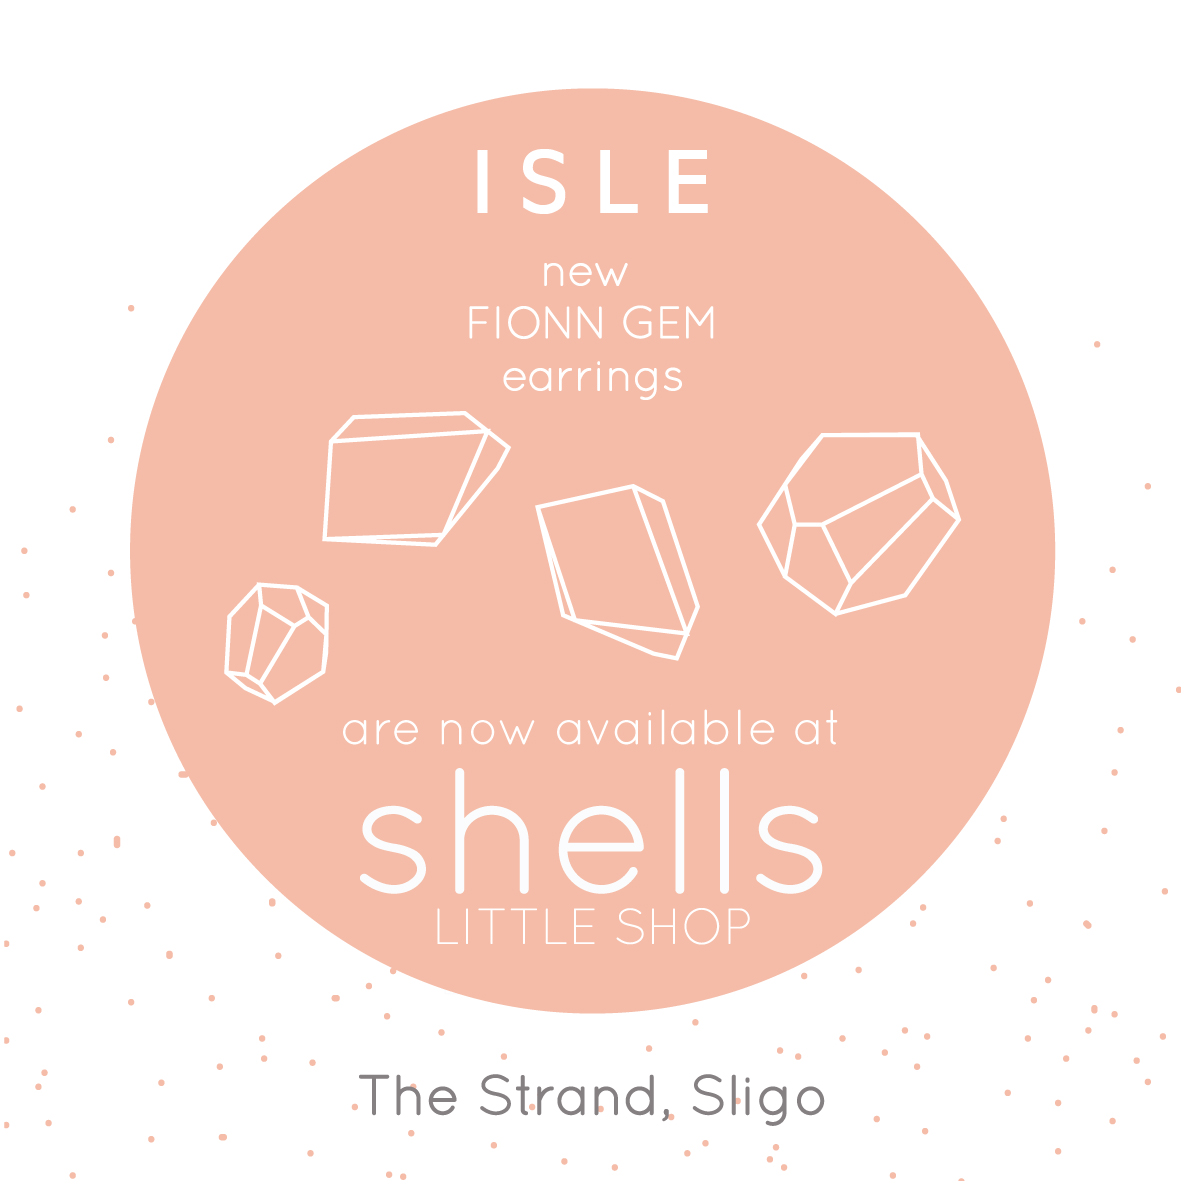 ISLE@shells